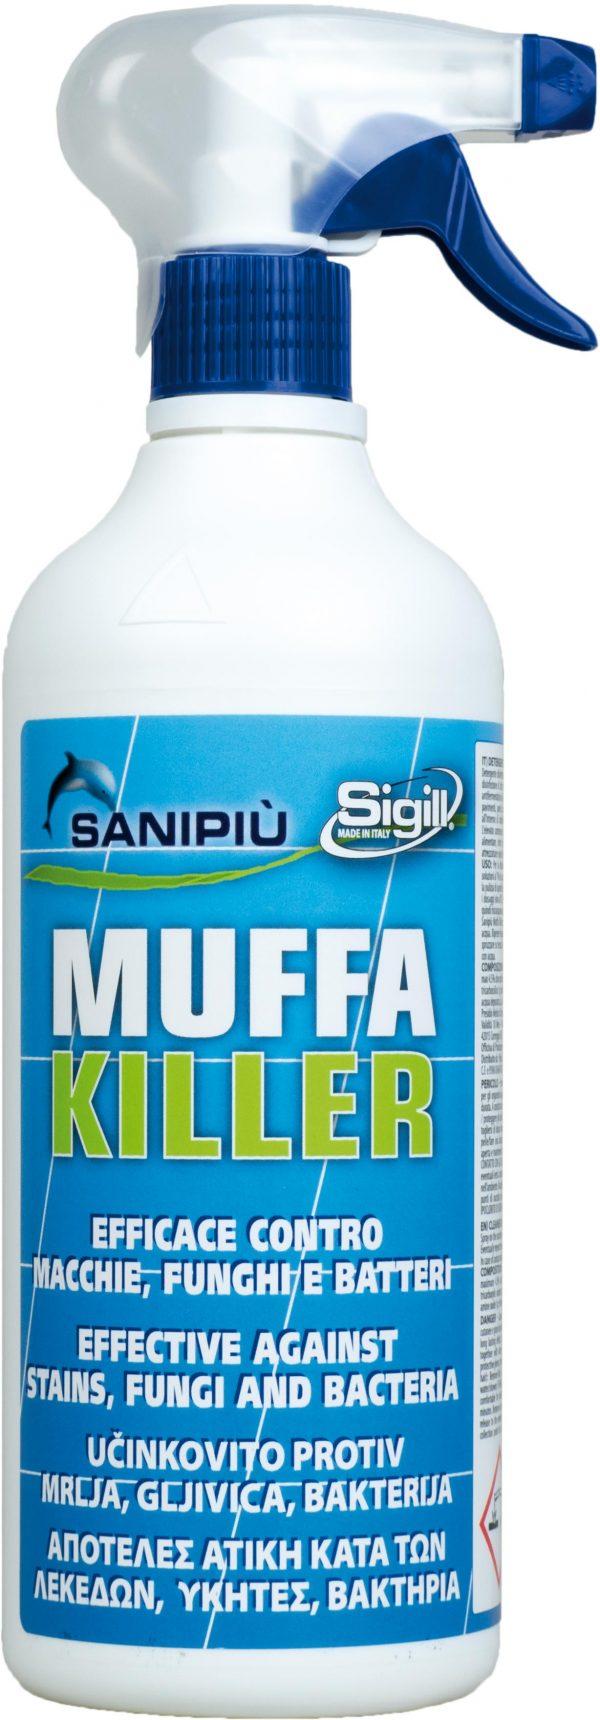 muffa killer, saniterm, antimussa spray